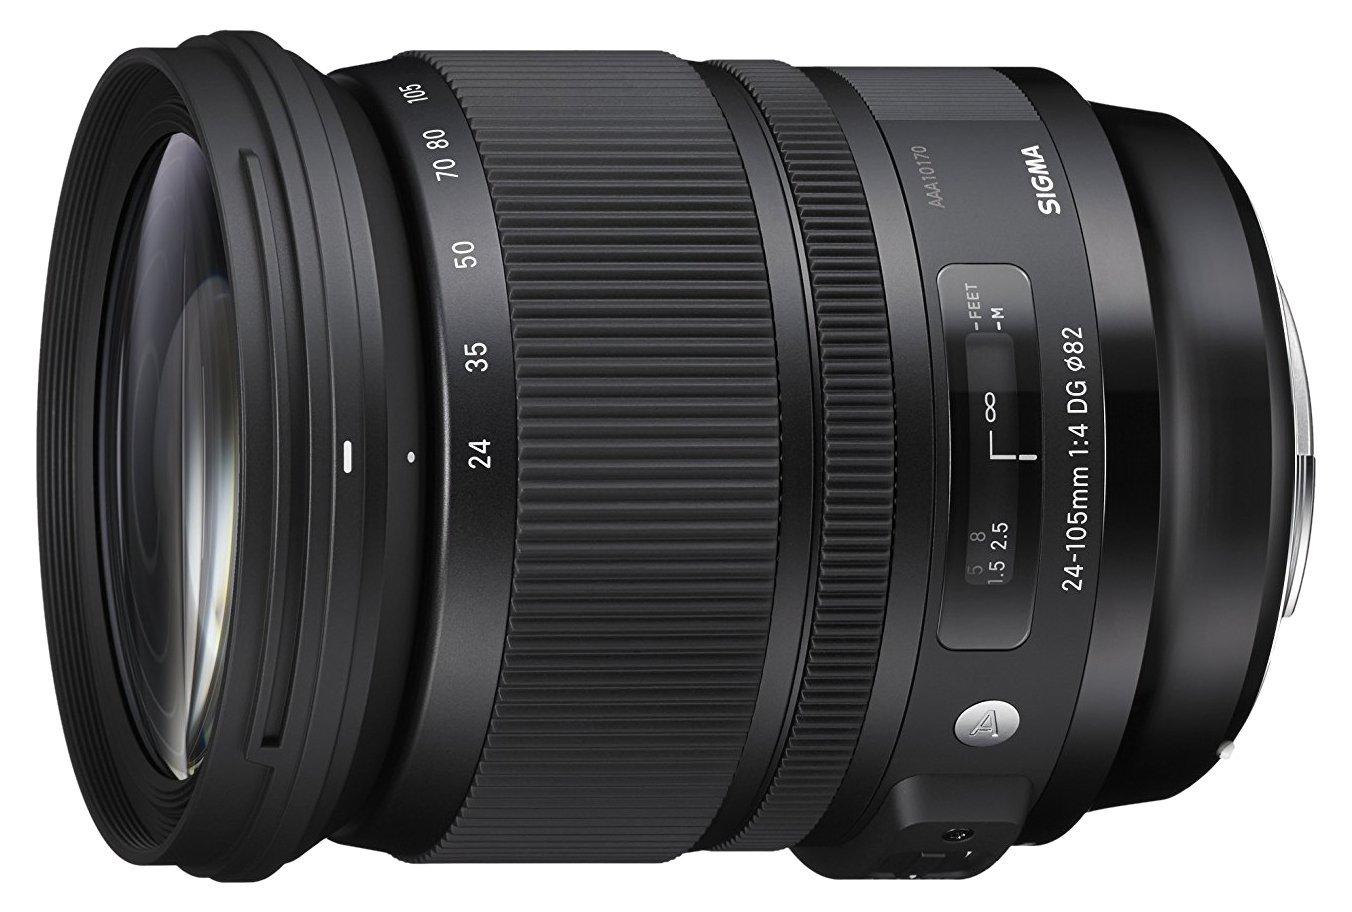 Sigma mm F DG OS HSM Objetivo para cámara réflex Nikon estabilizador